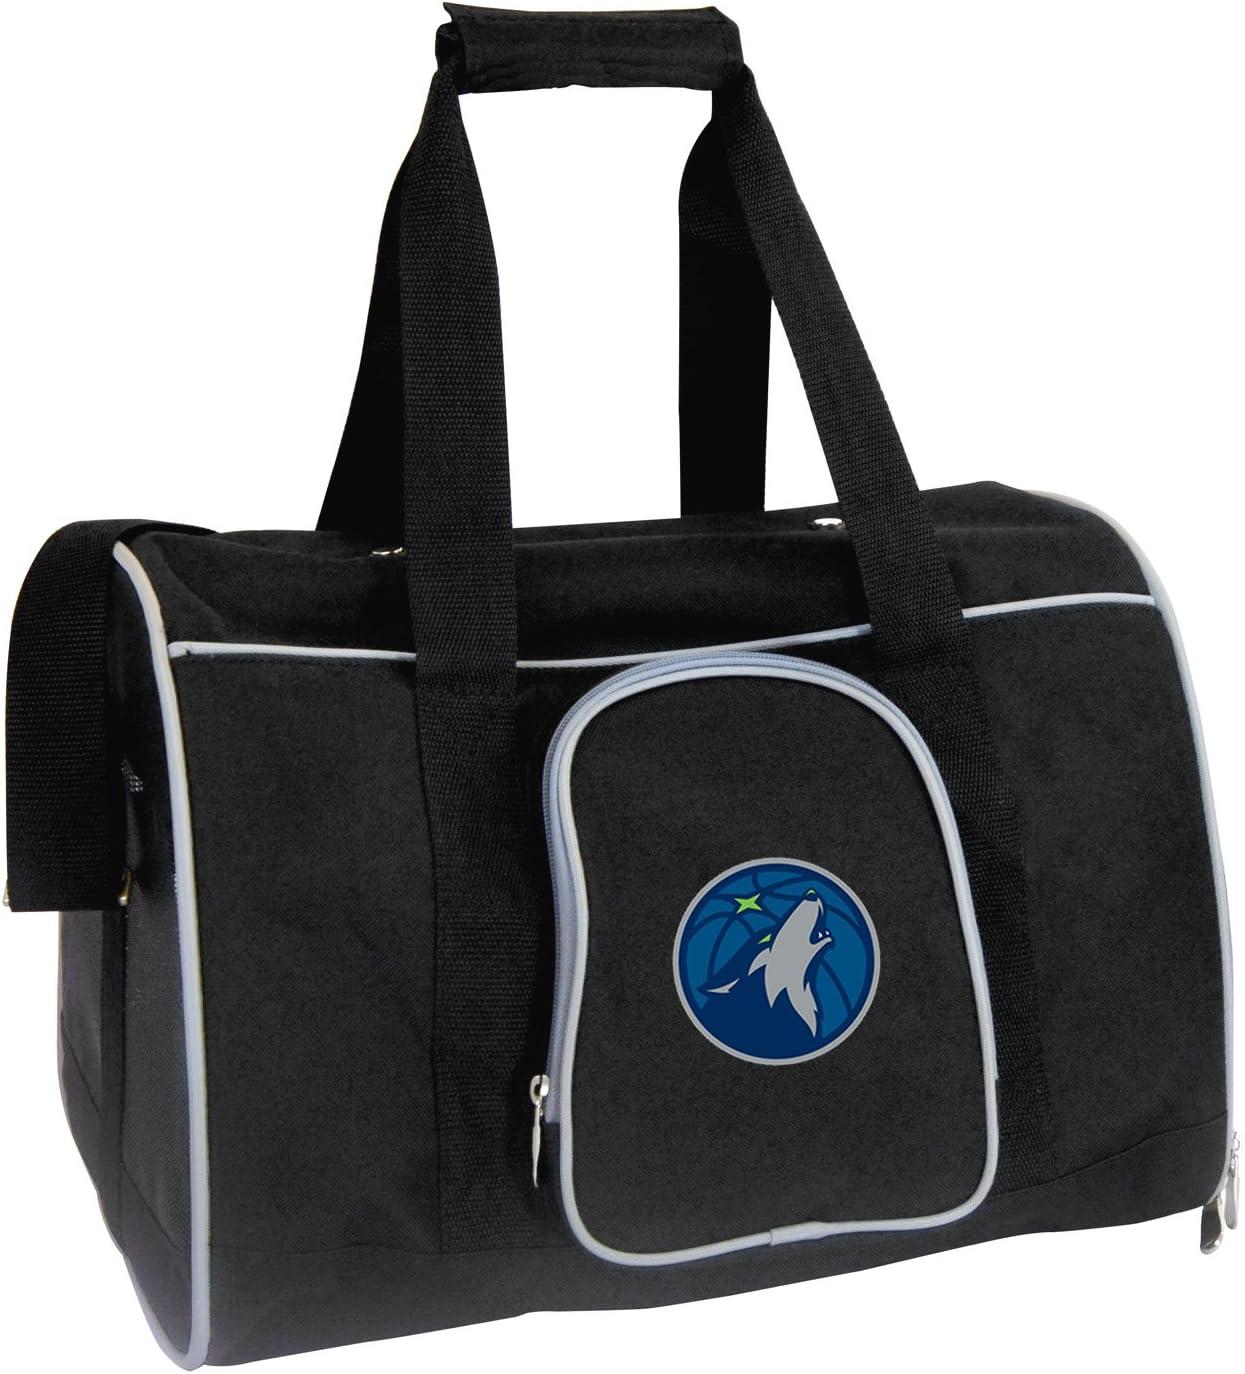 Denco NBA Minnesota Timberwolves Premium Pet Carrier